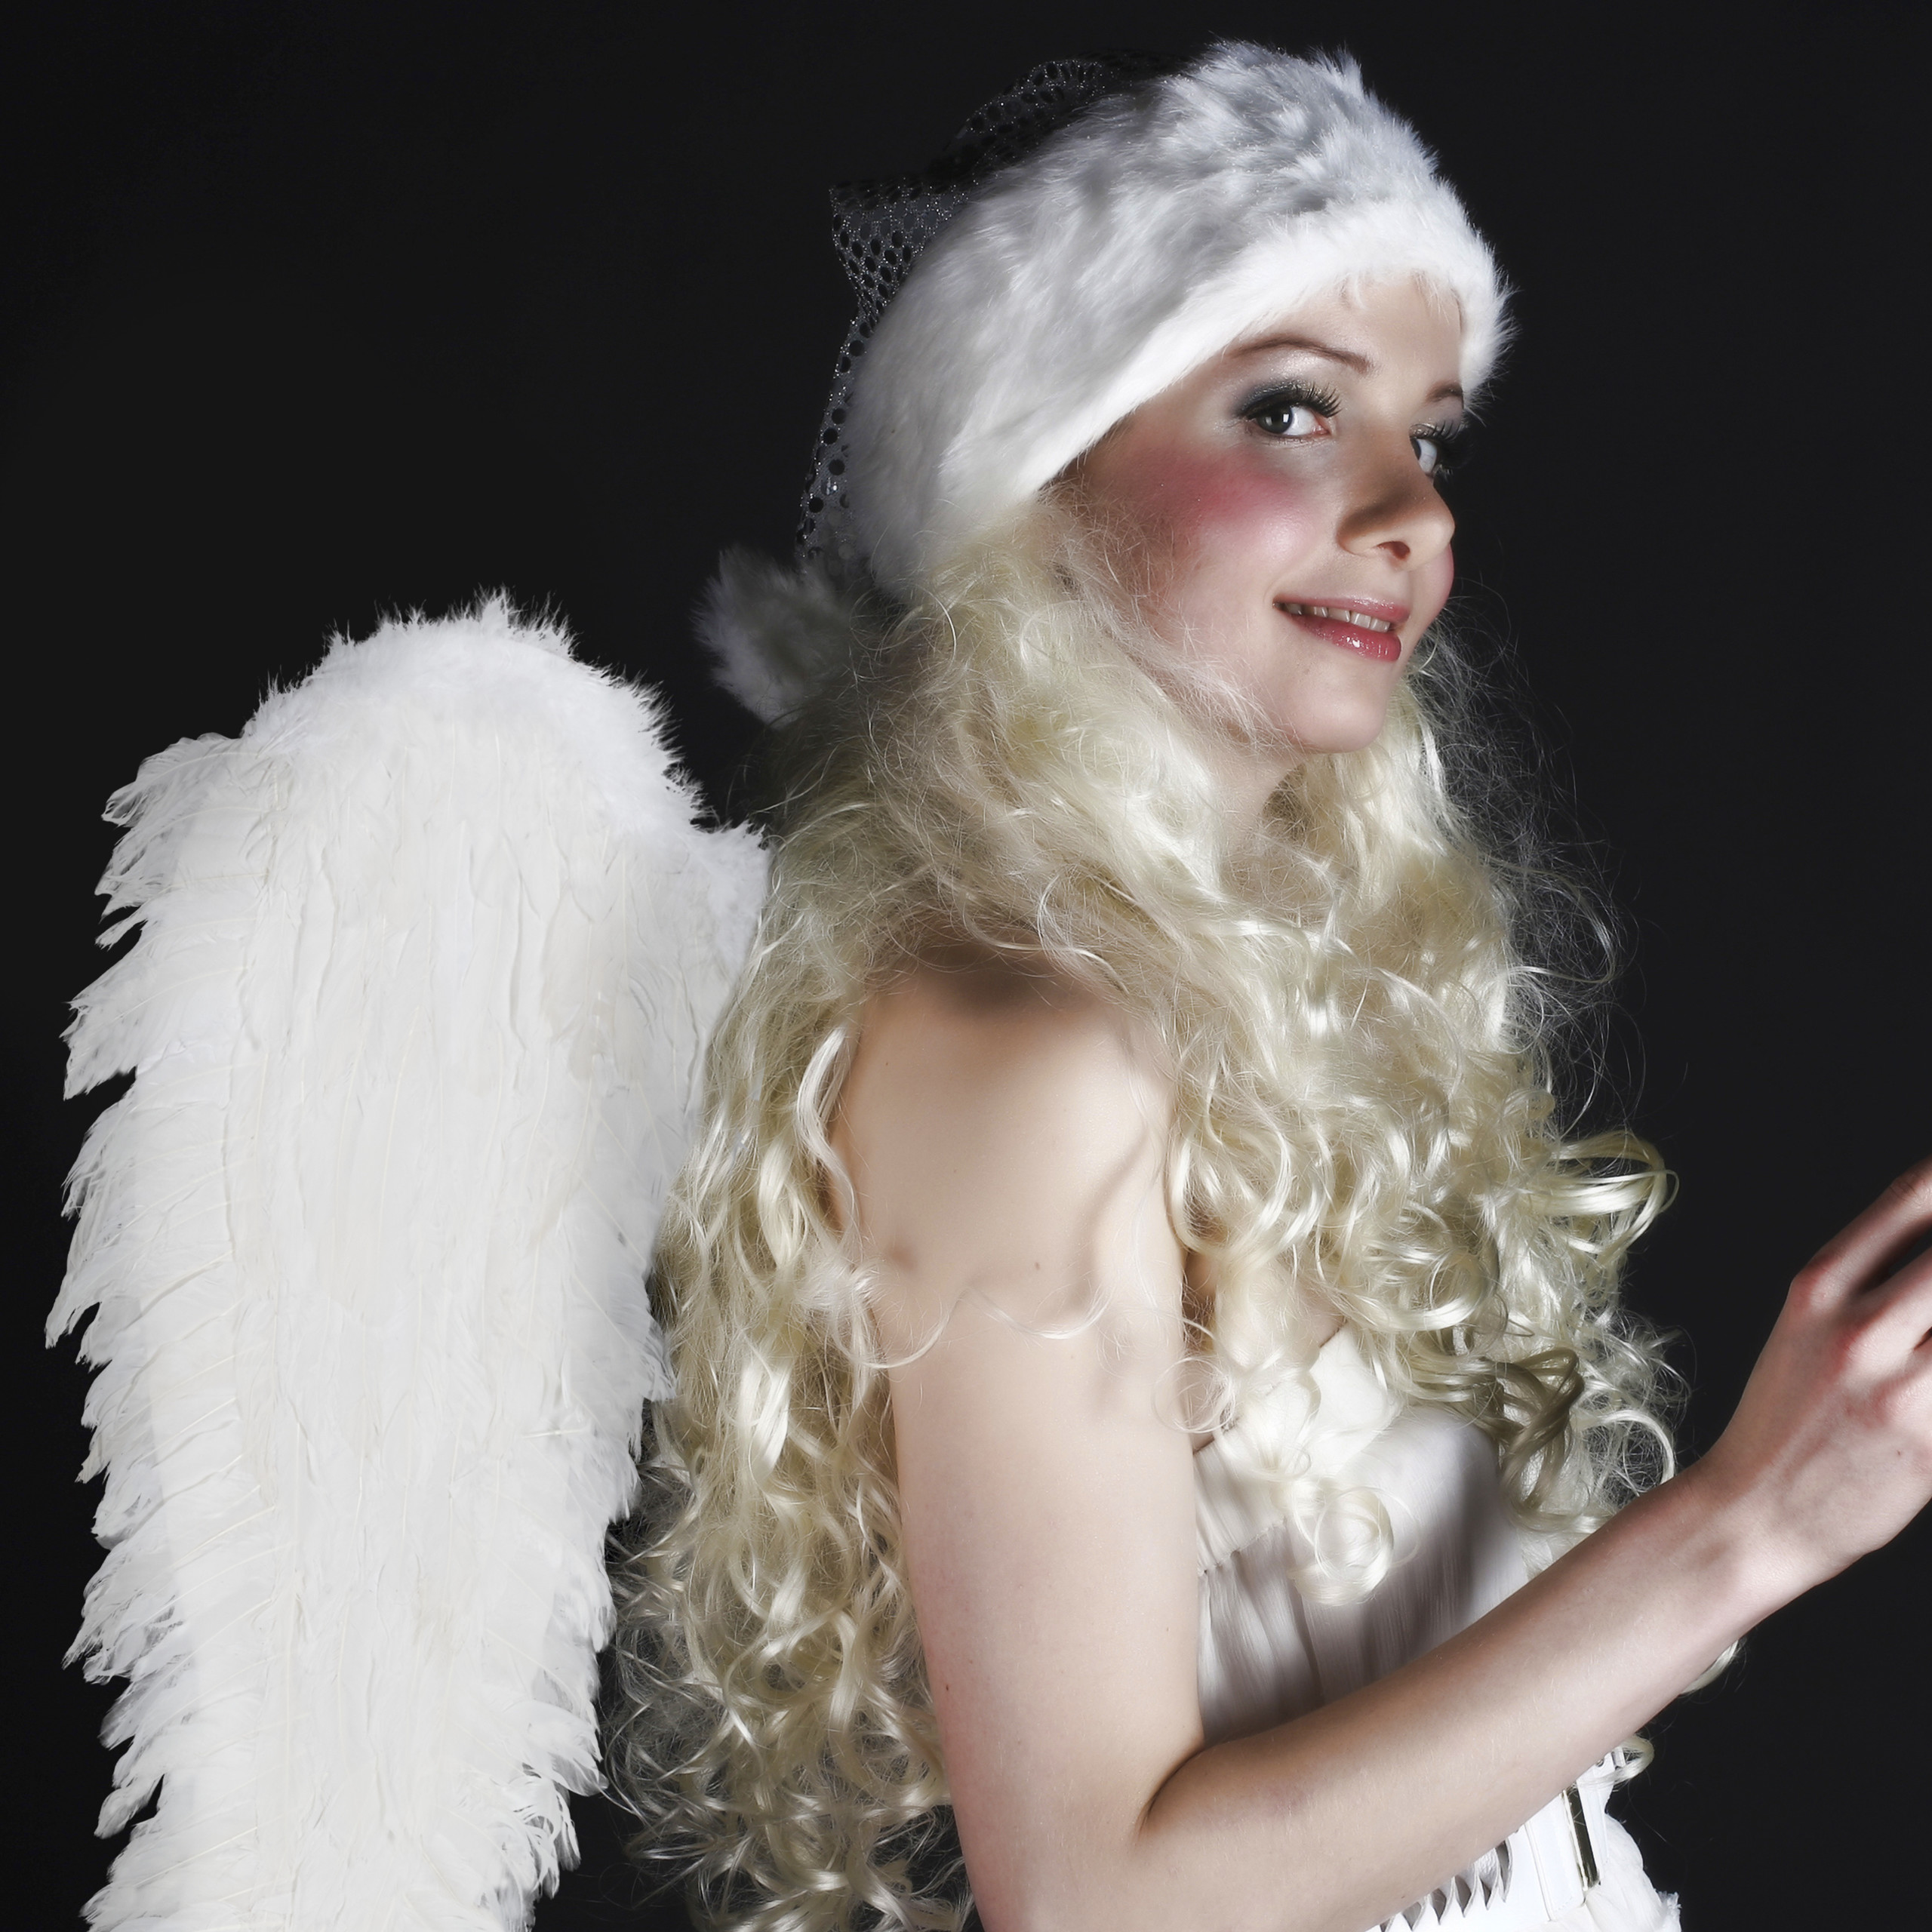 vleugels-verkleedkleding-XXL-engelenvleugels-engelkostuum-kunstveren miniatuur 13